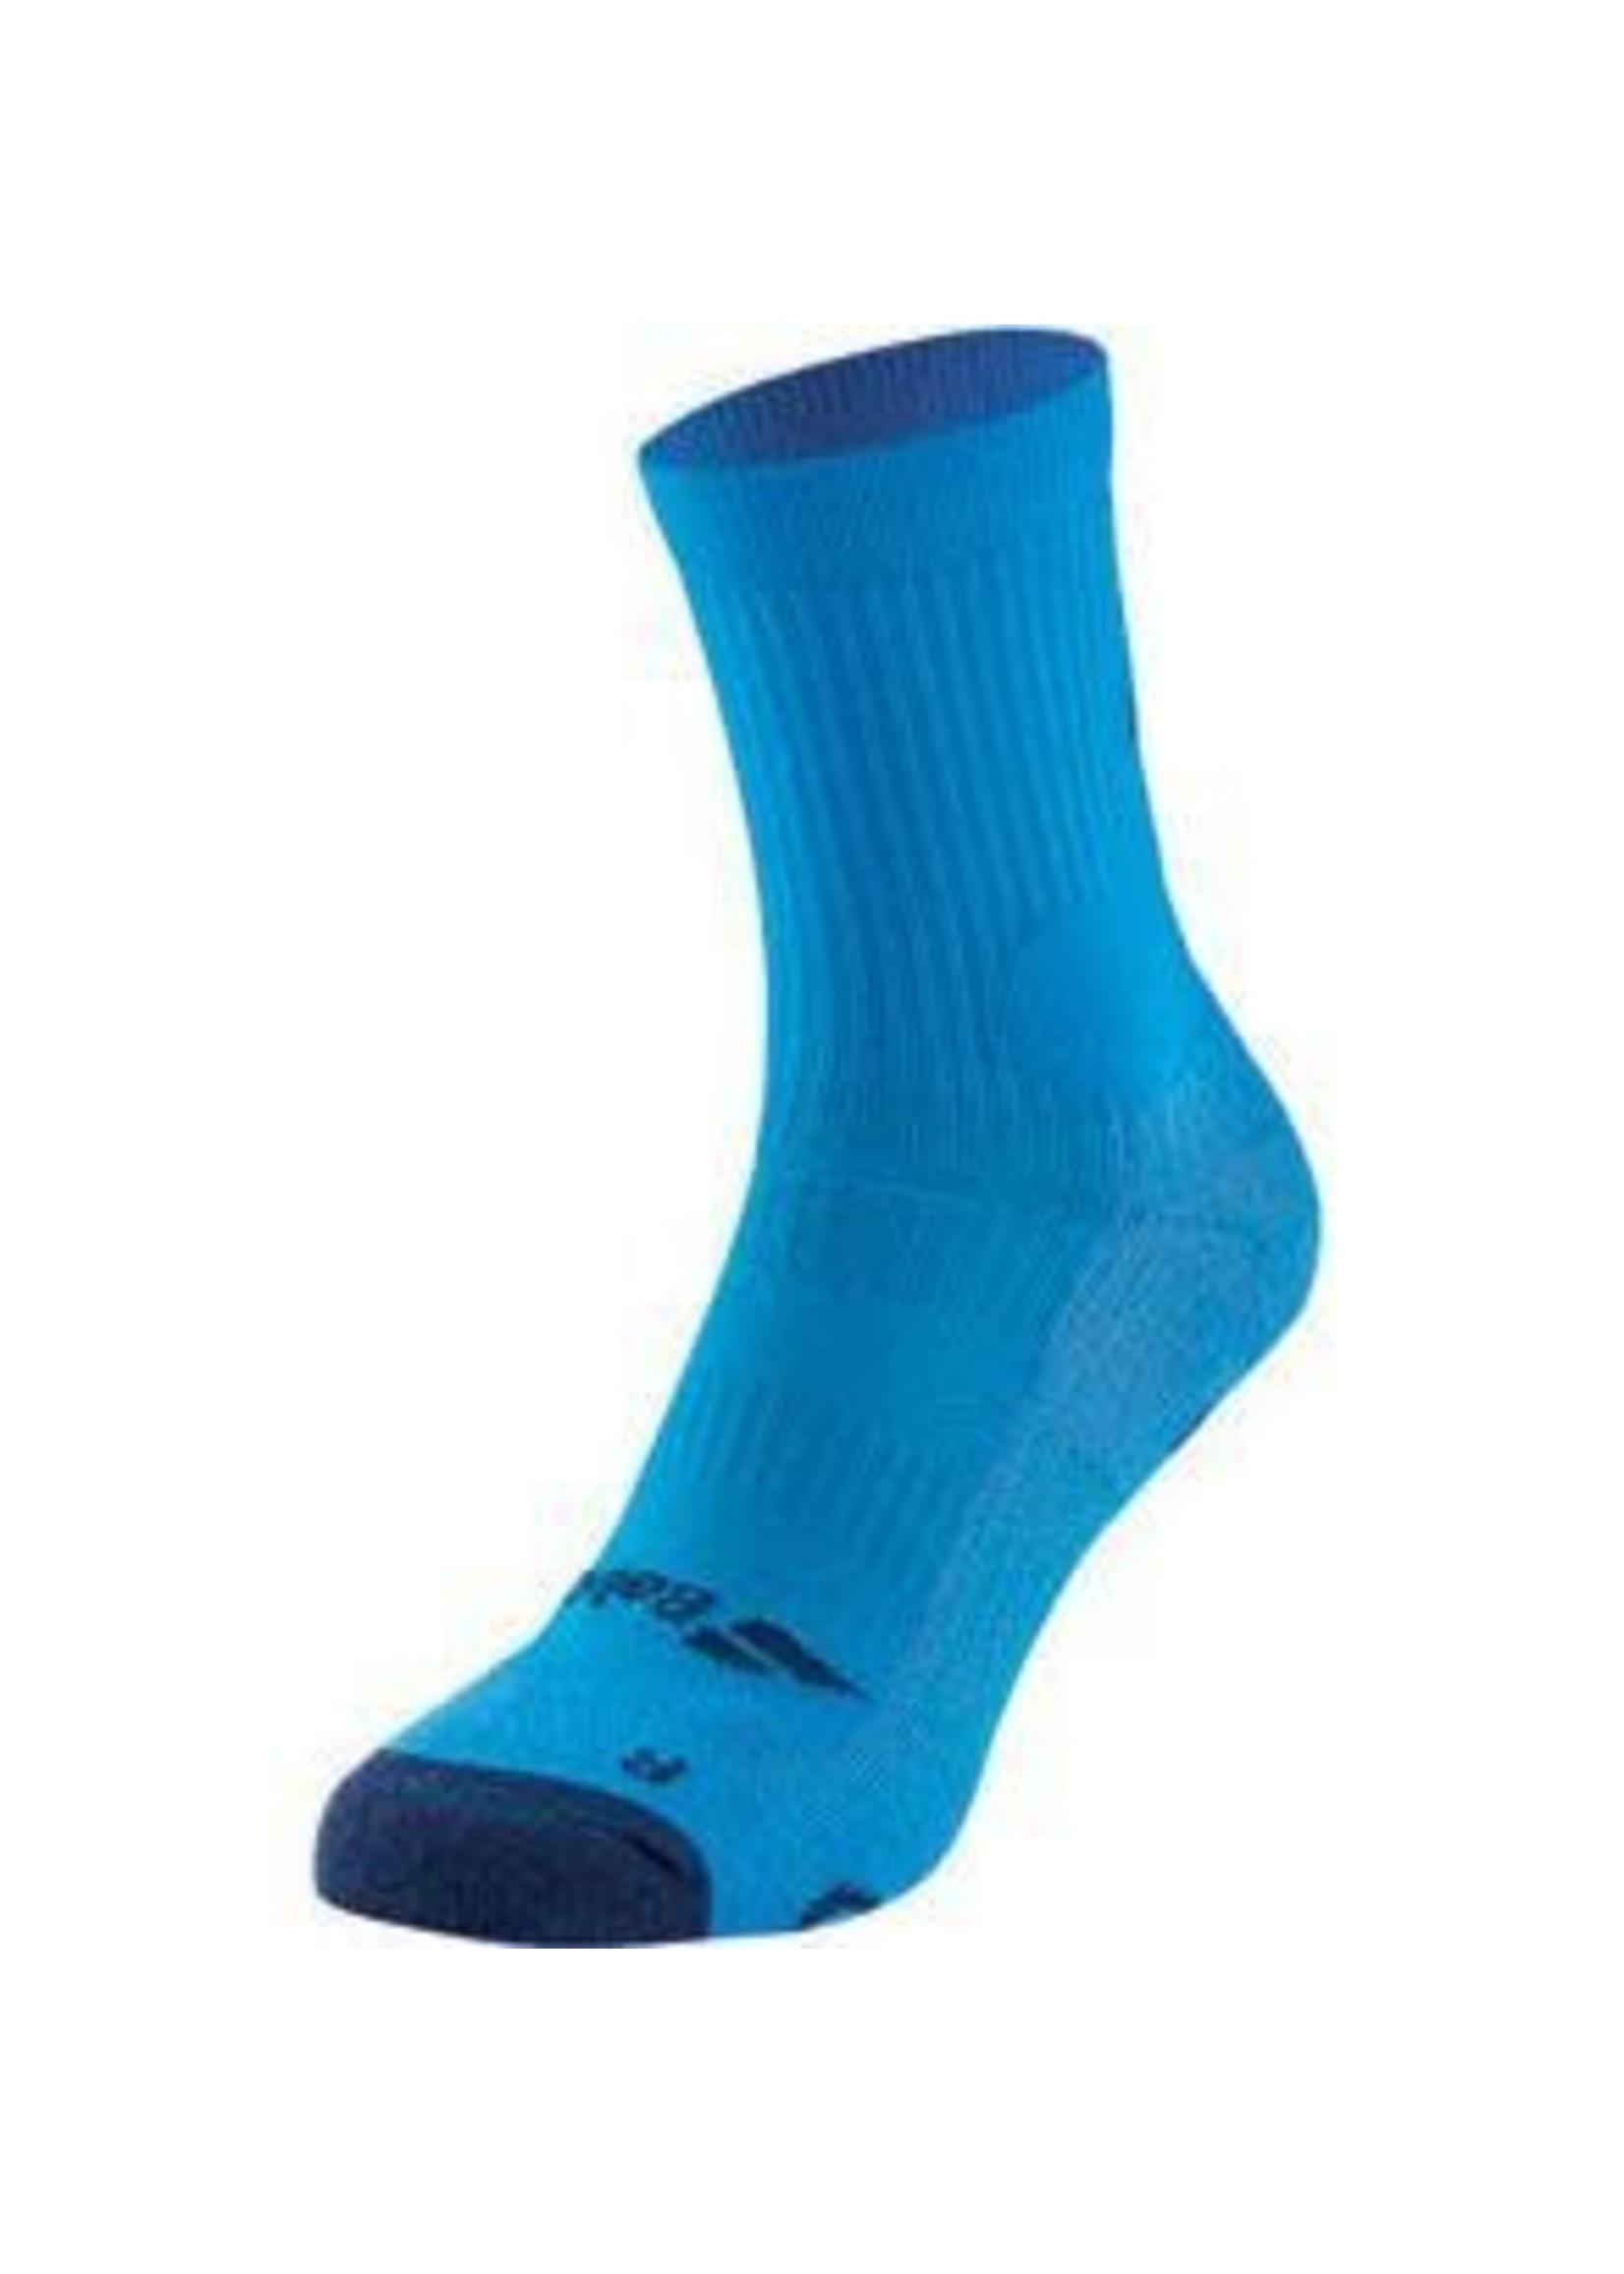 Babolat Babolat Pro 360 Drive Mens Tennis Socks (2021)